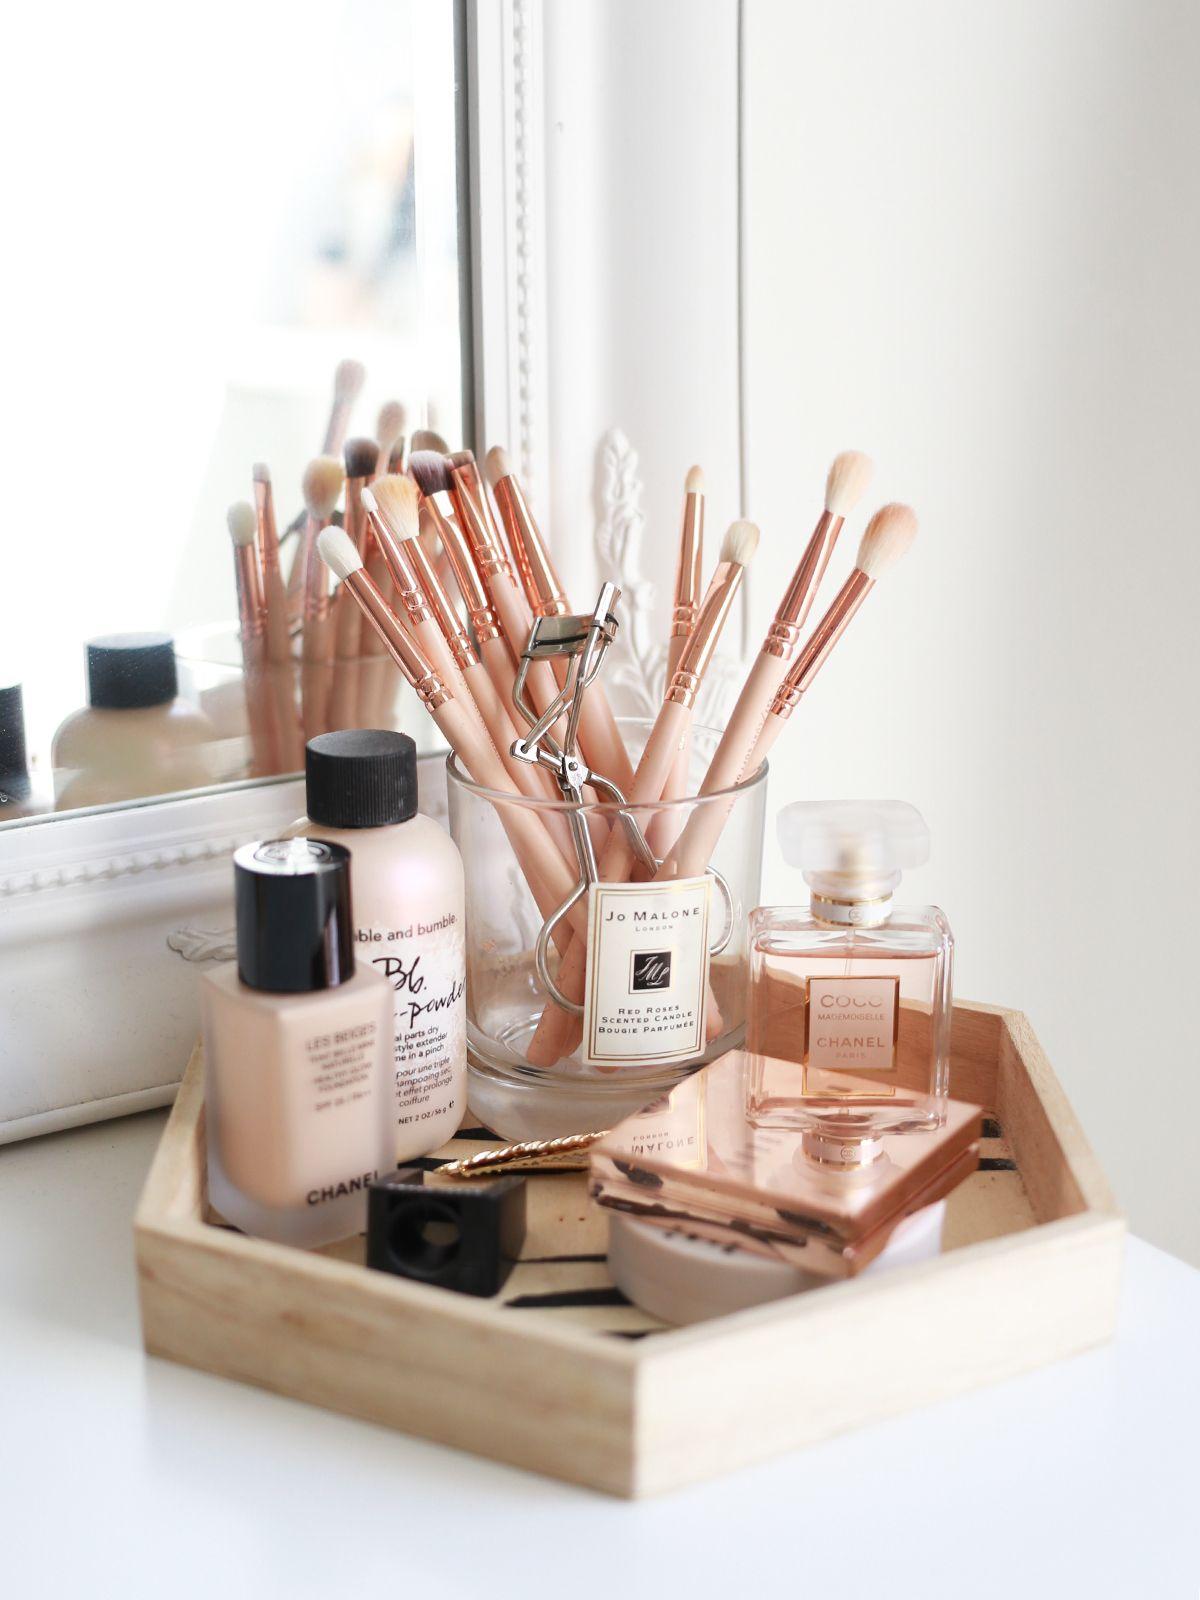 25+ Best Makeup Storage Ideas On Pinterest | Makeup Organization, Makeup  Storage Organization And Makeup Tables